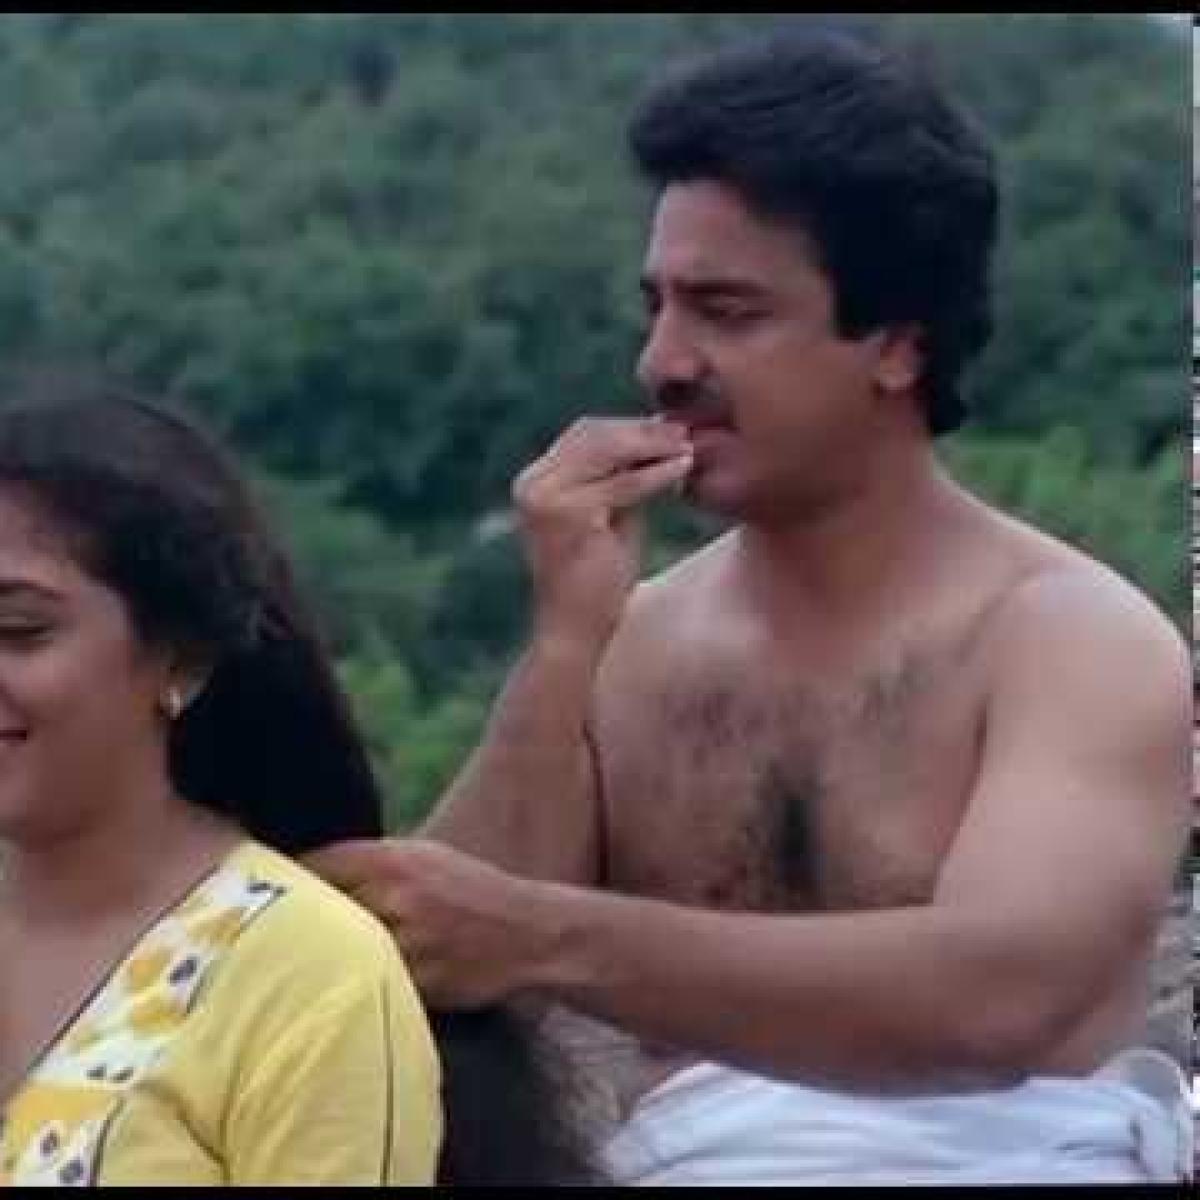 'Kamal Haasan should say sorry to Tamil star Rekha for 'unplanned kiss' in film': Tweeple